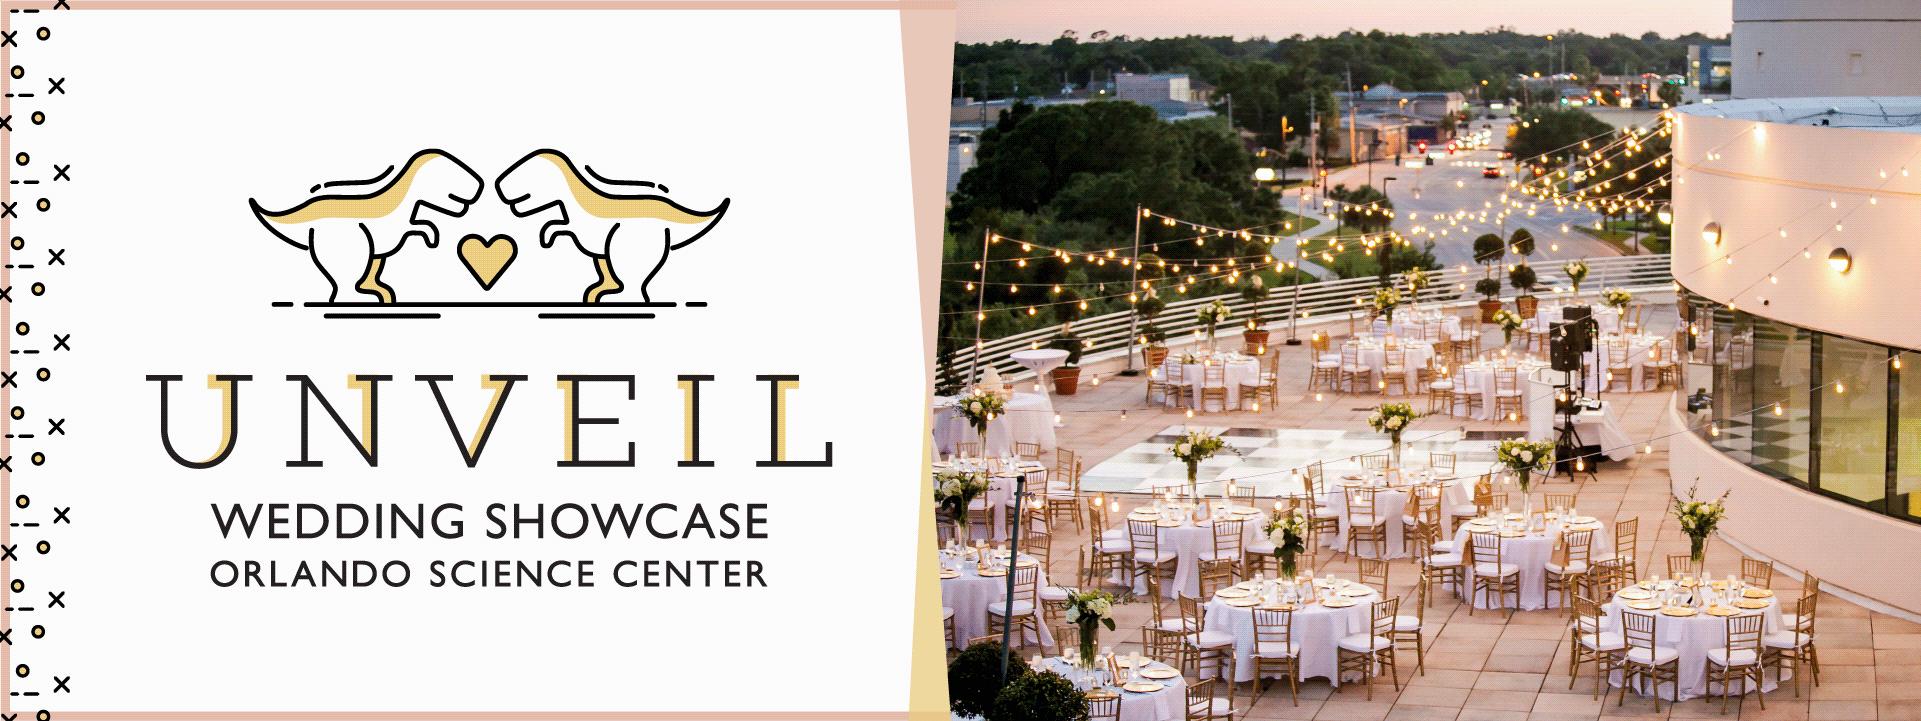 Unveil Wedding Showcase Orlando Science Center